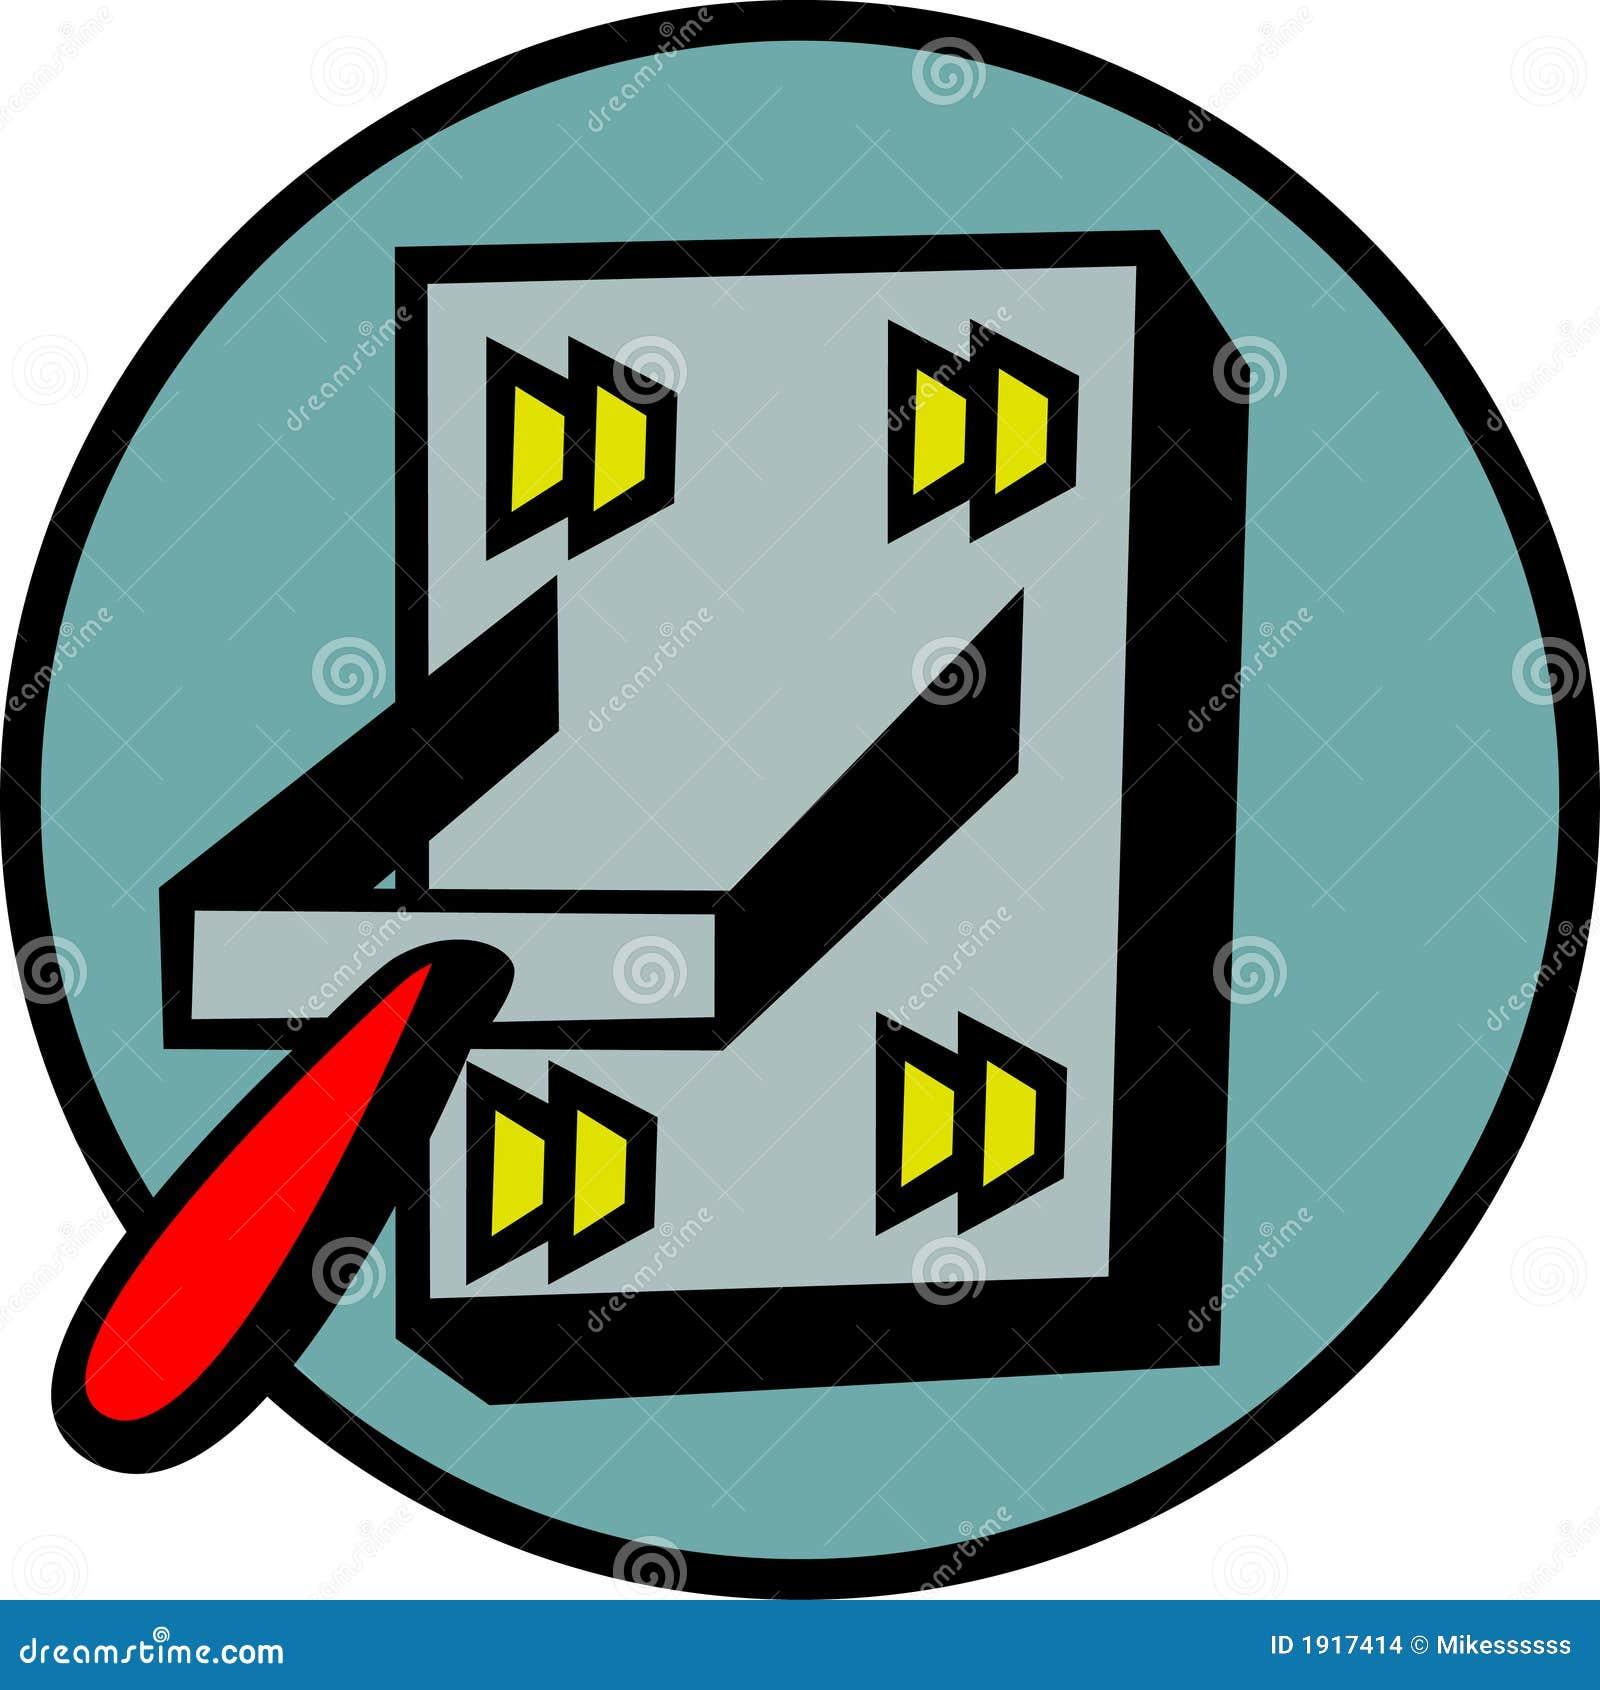 power switch vector illustration stock images image 1917414. Black Bedroom Furniture Sets. Home Design Ideas